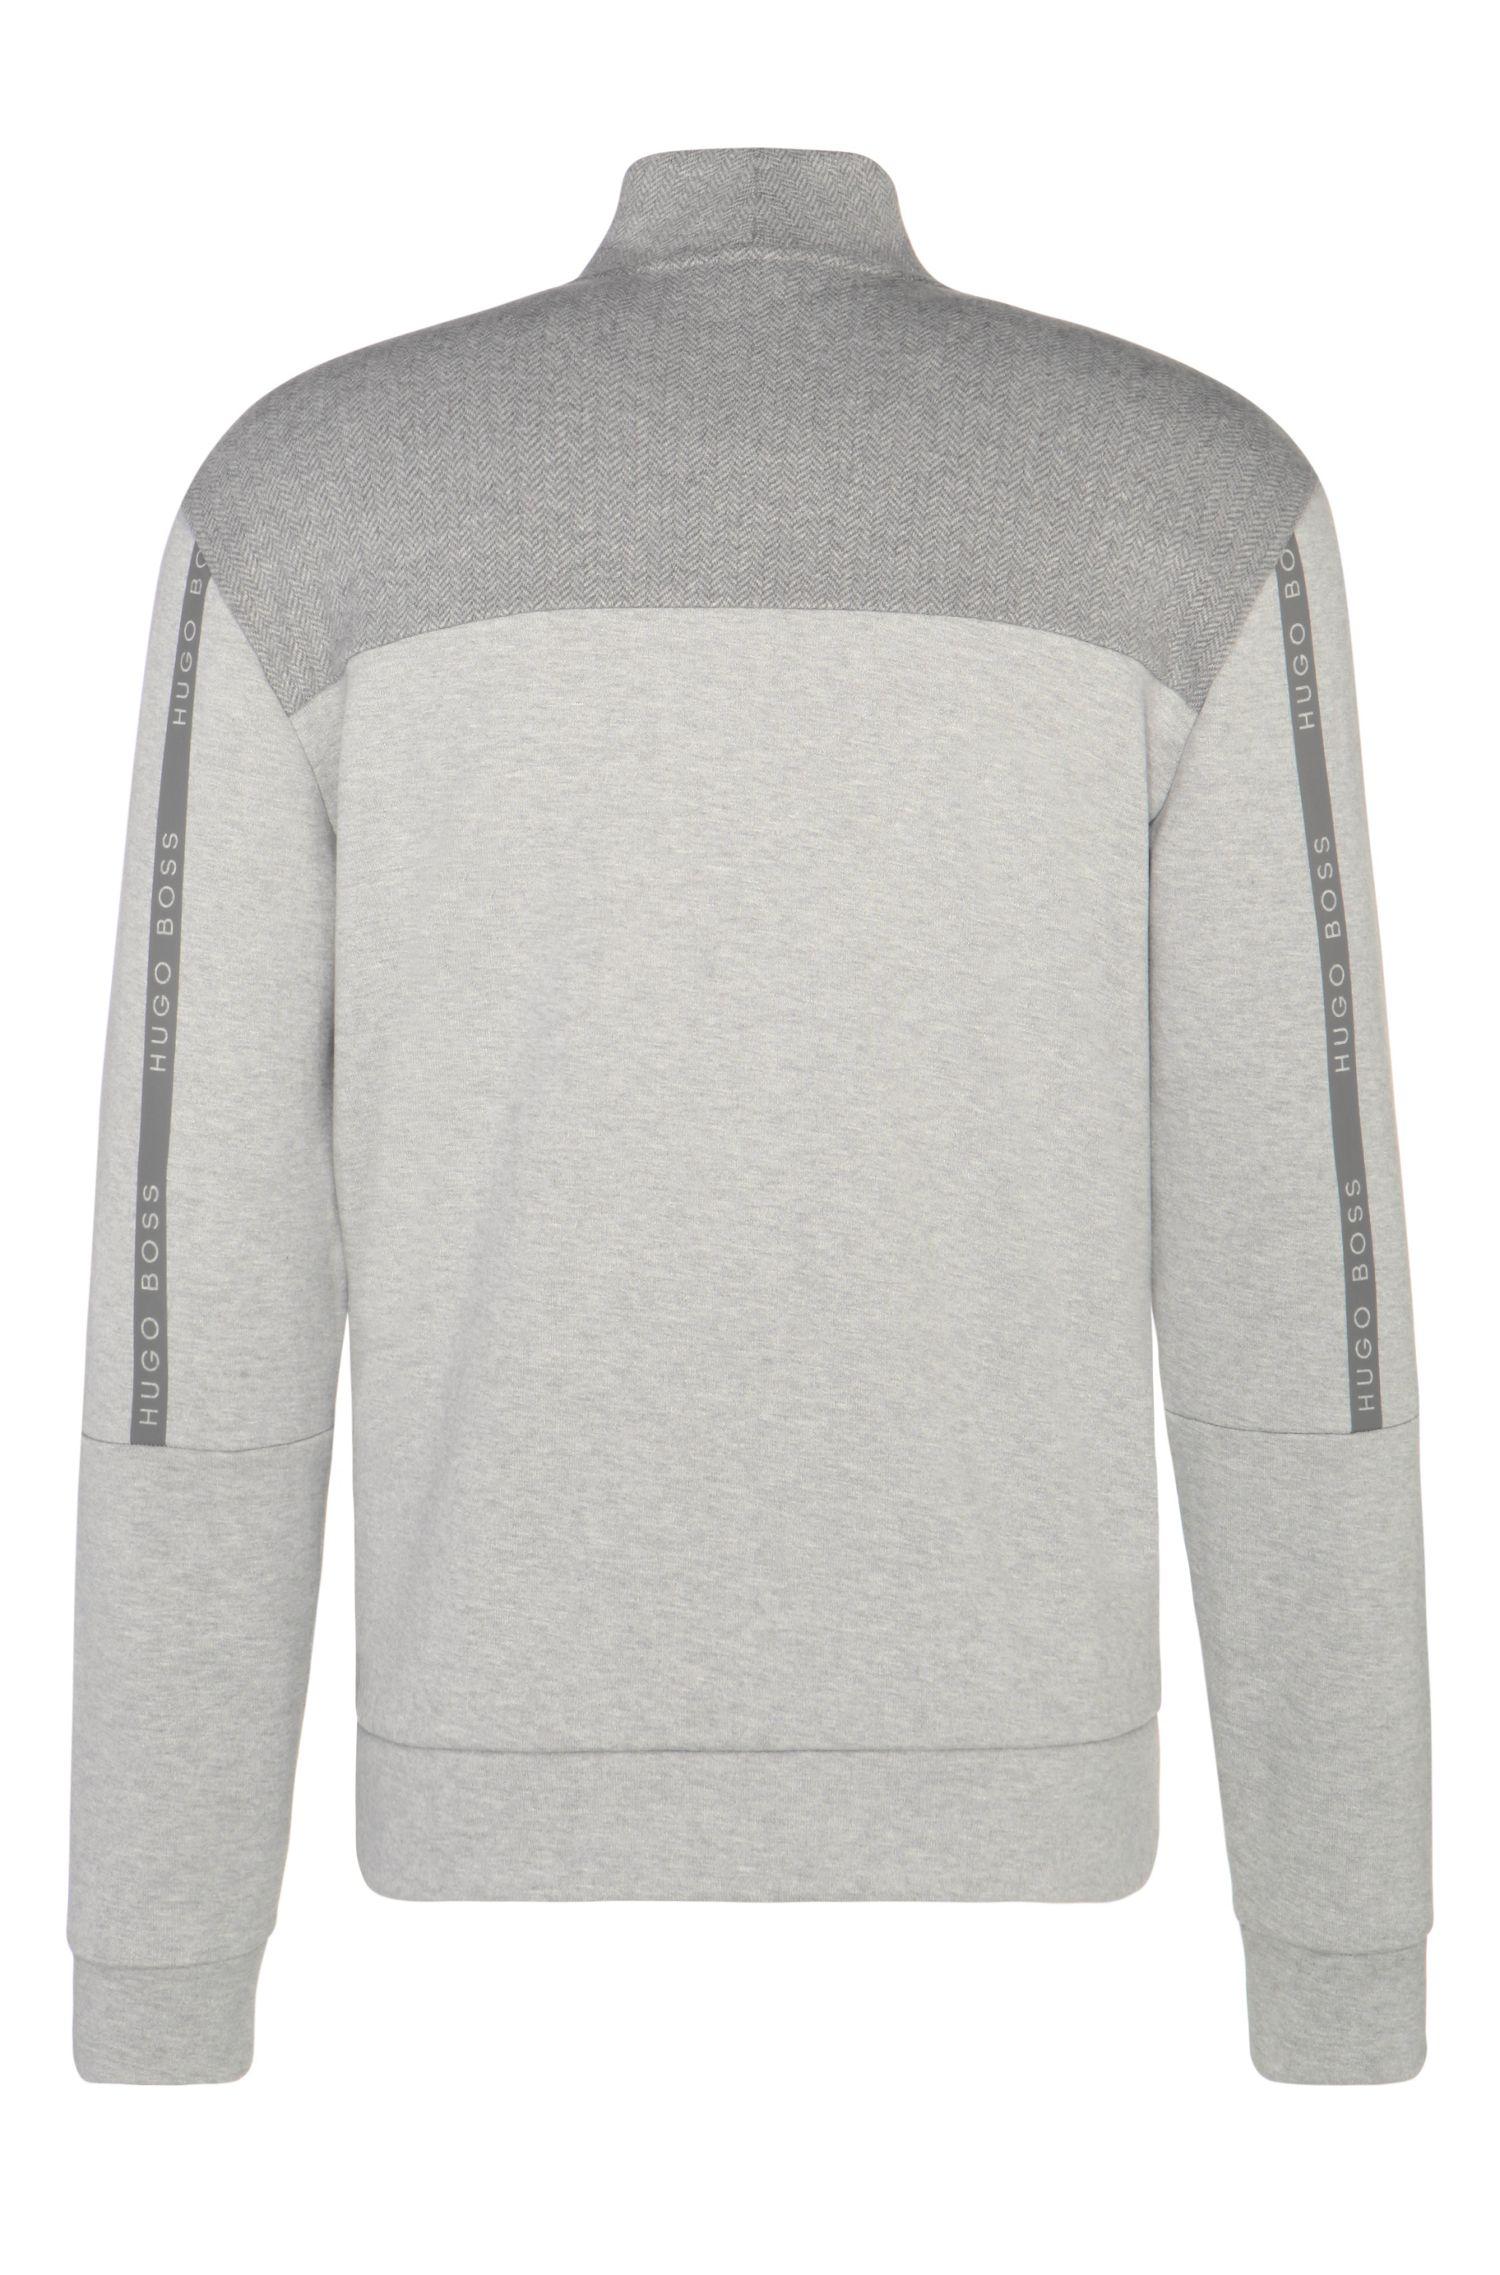 Sweatshirt-Jacke aus Baumwoll-Mix: ´Selwyn`